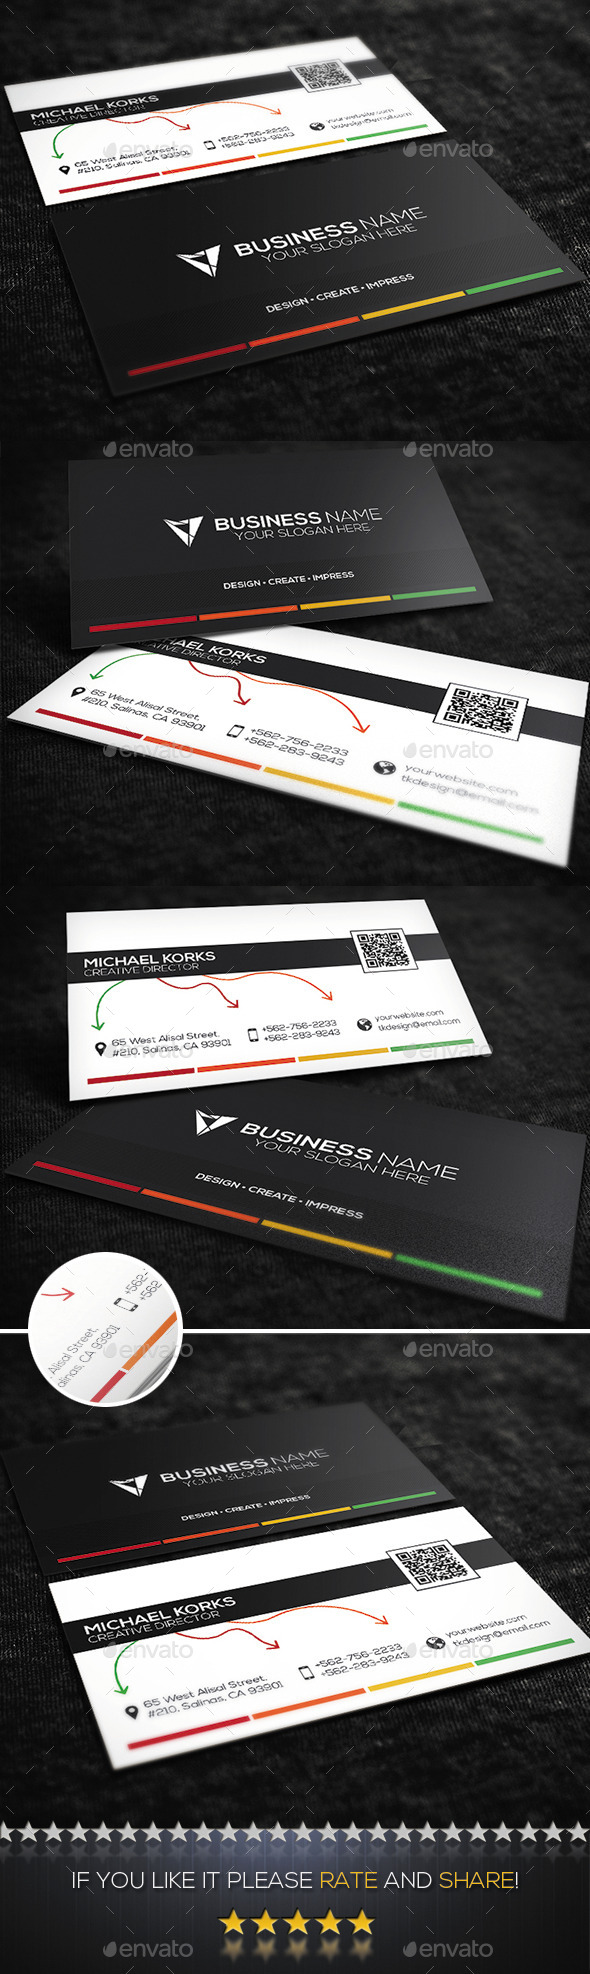 Creative Business Card No.08 - Creative Business Cards